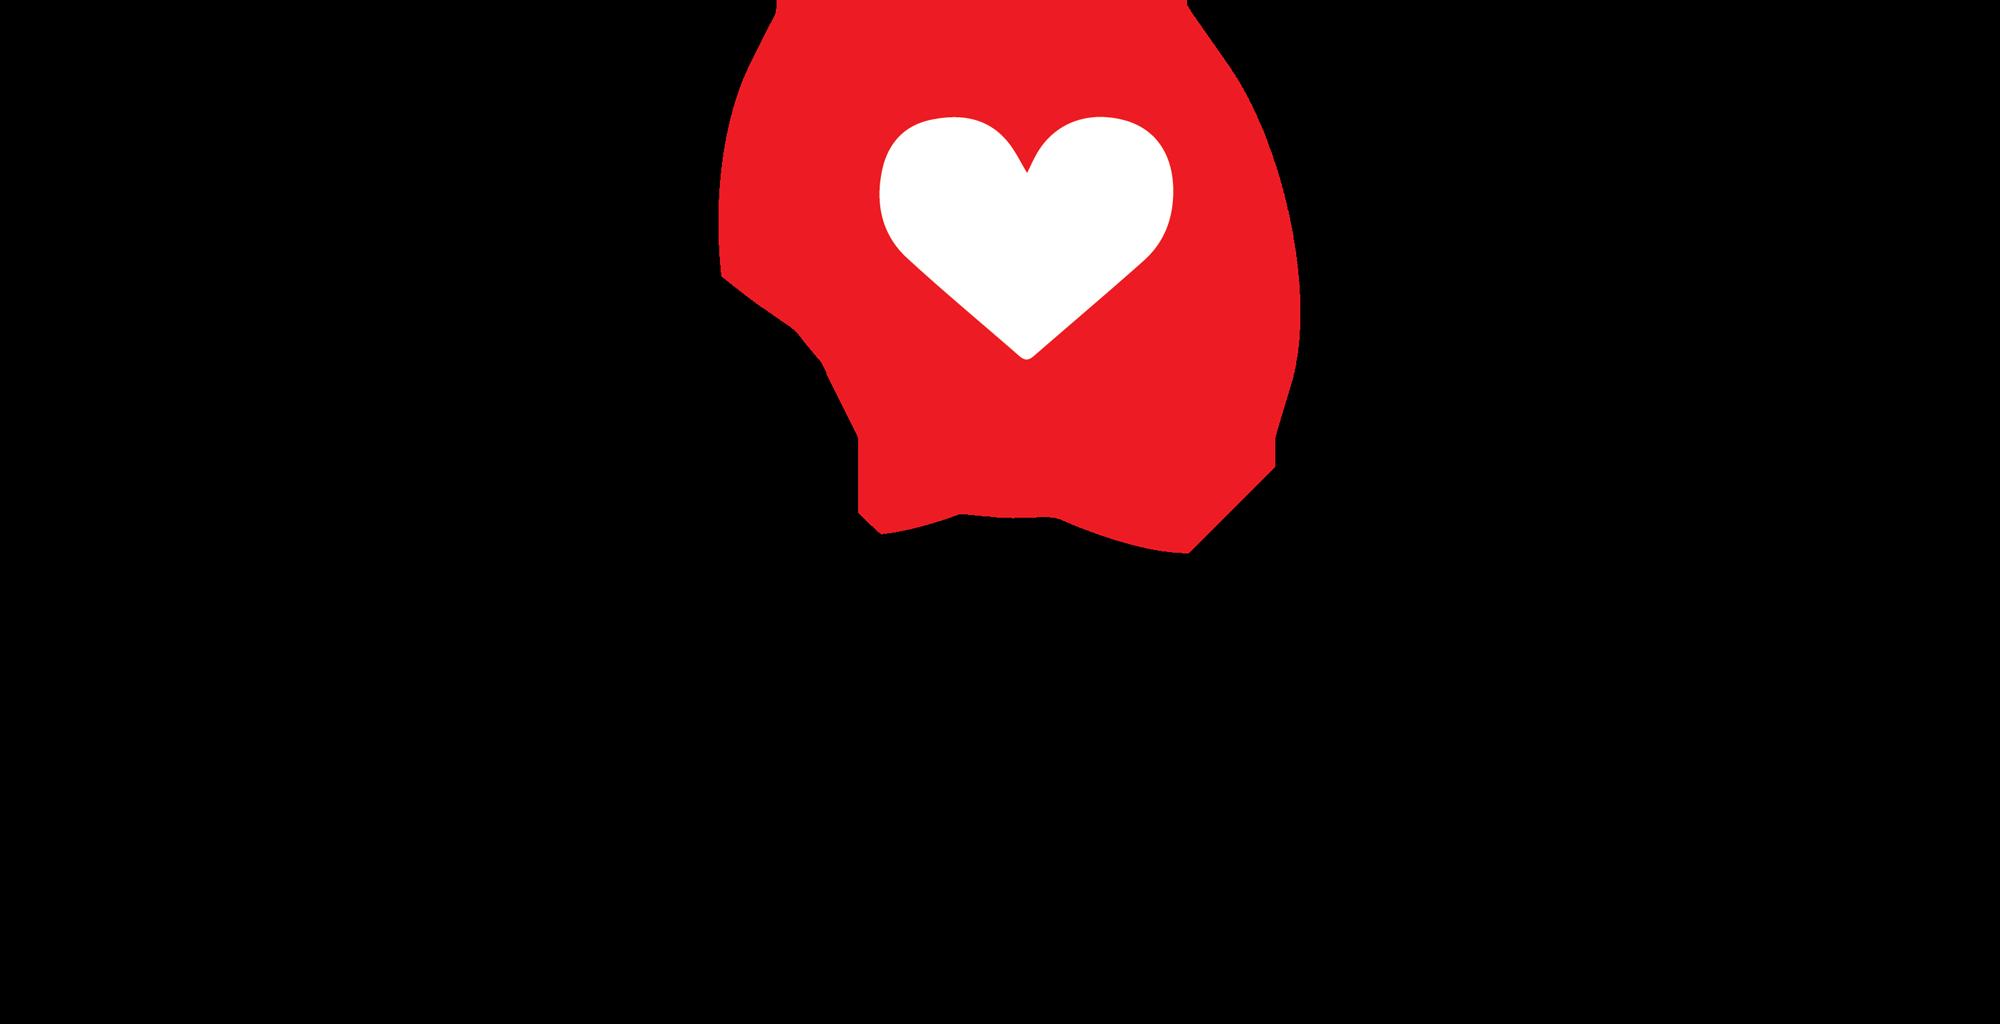 #LoveArmy